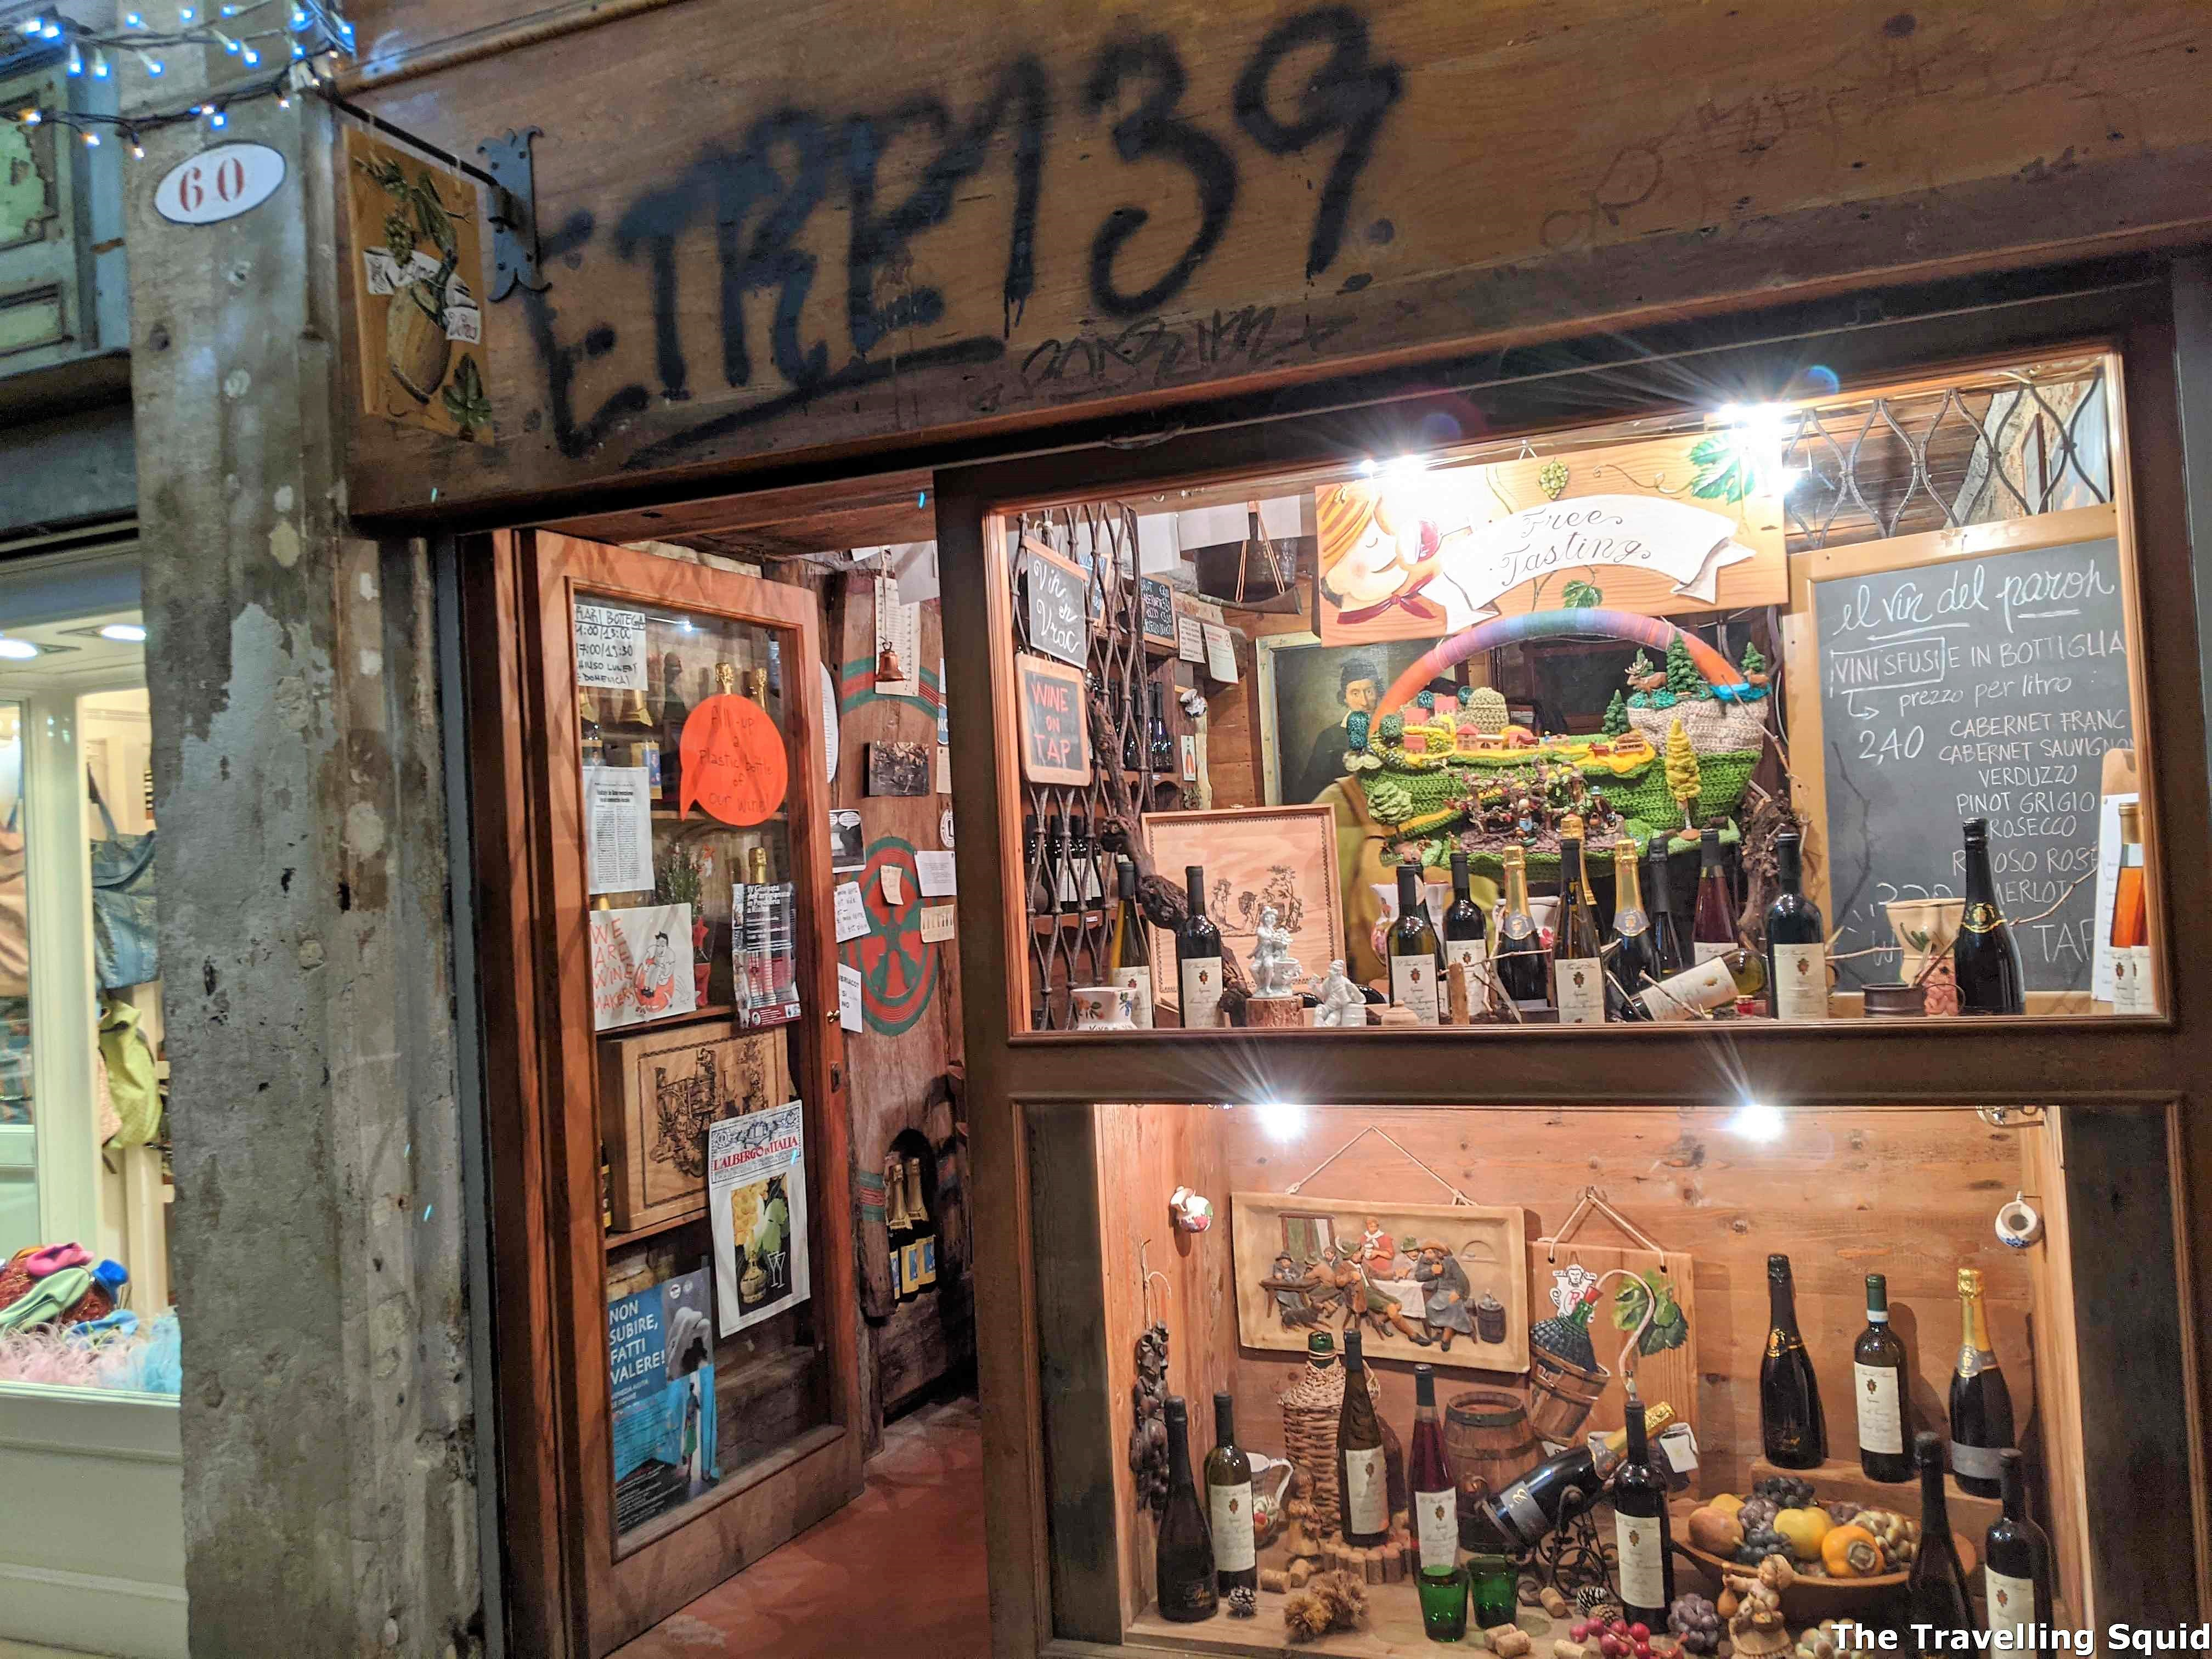 El Vin Del Paron for affordable wine in Venice